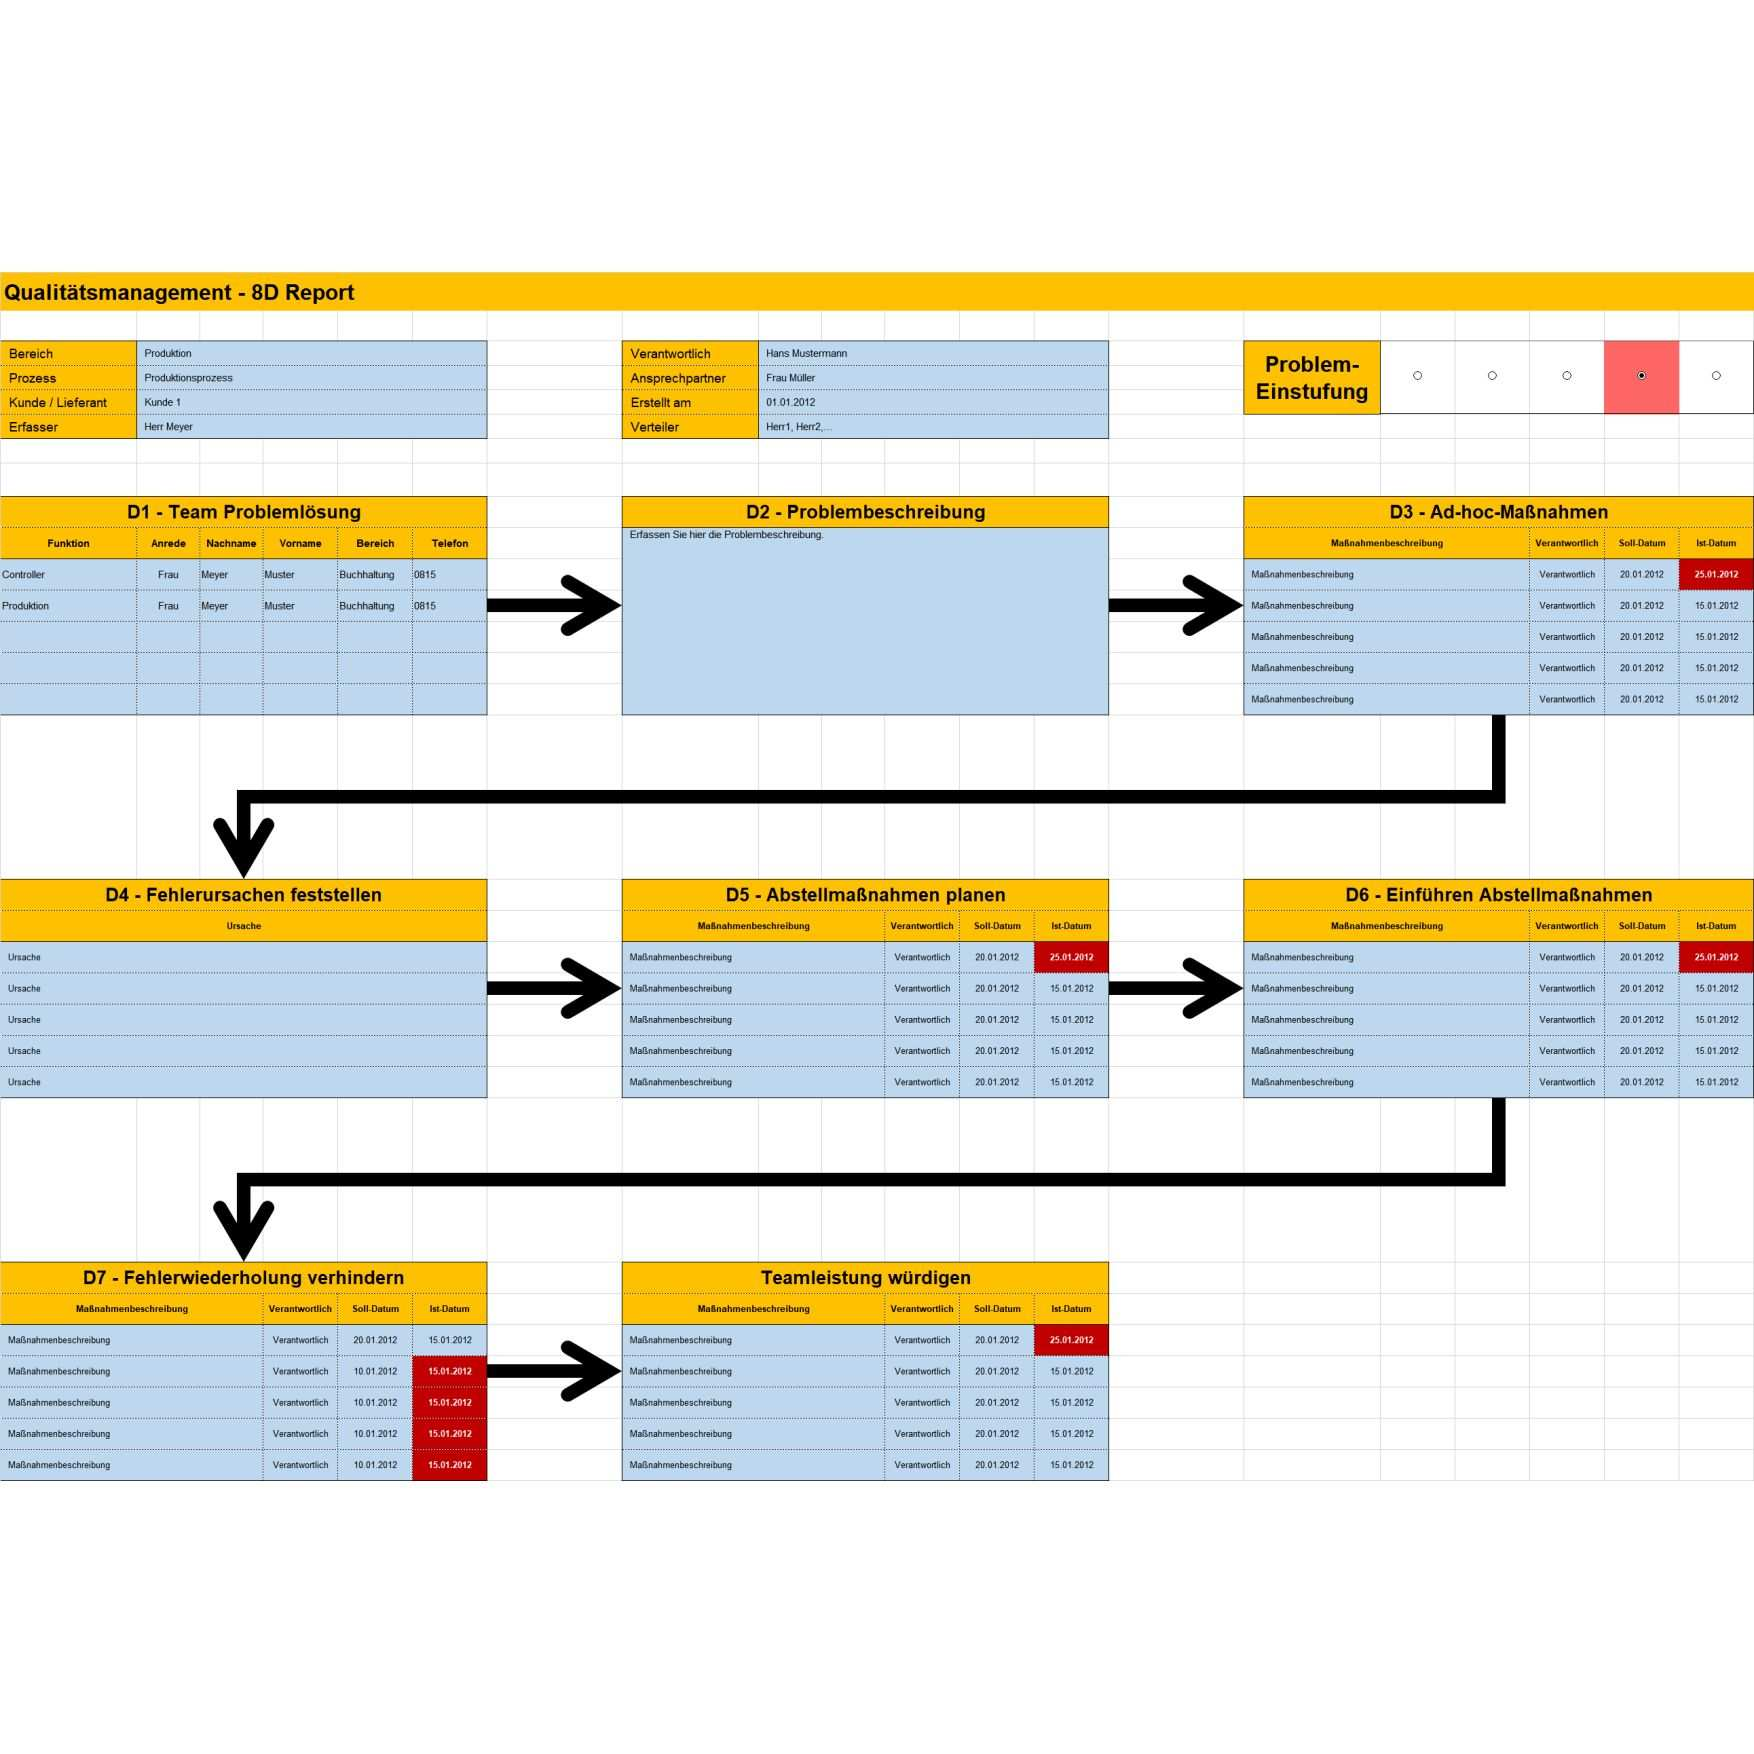 8d Report Vorlage 8d Report 2019 12 10 For 8d Report Template Xls Best Sample Template Report Template Templates Professional Templates